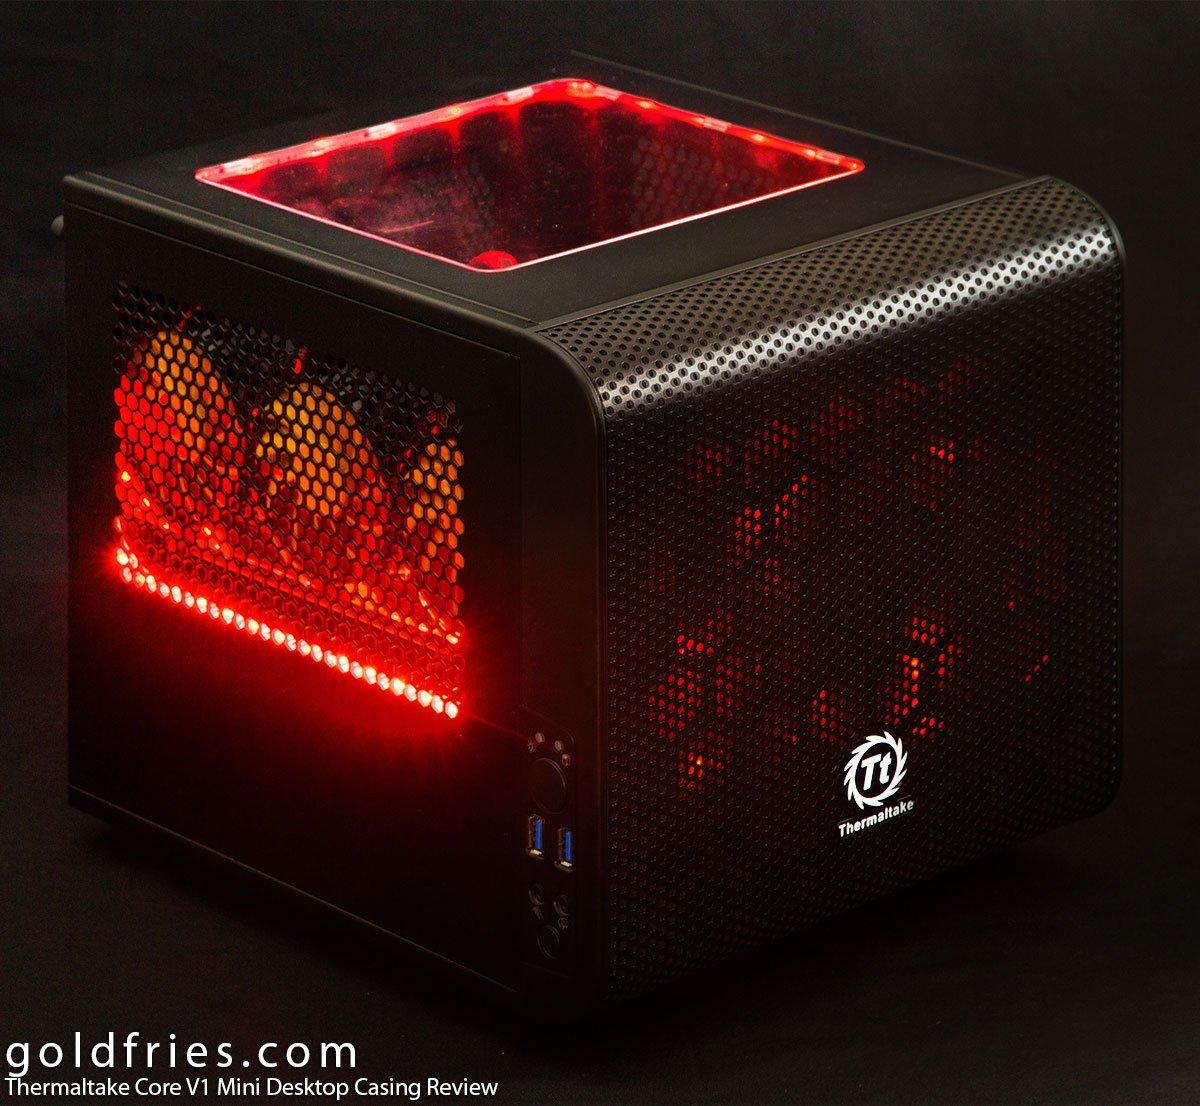 ThermalTake Core V1 Mini Desktop Casing Review 2